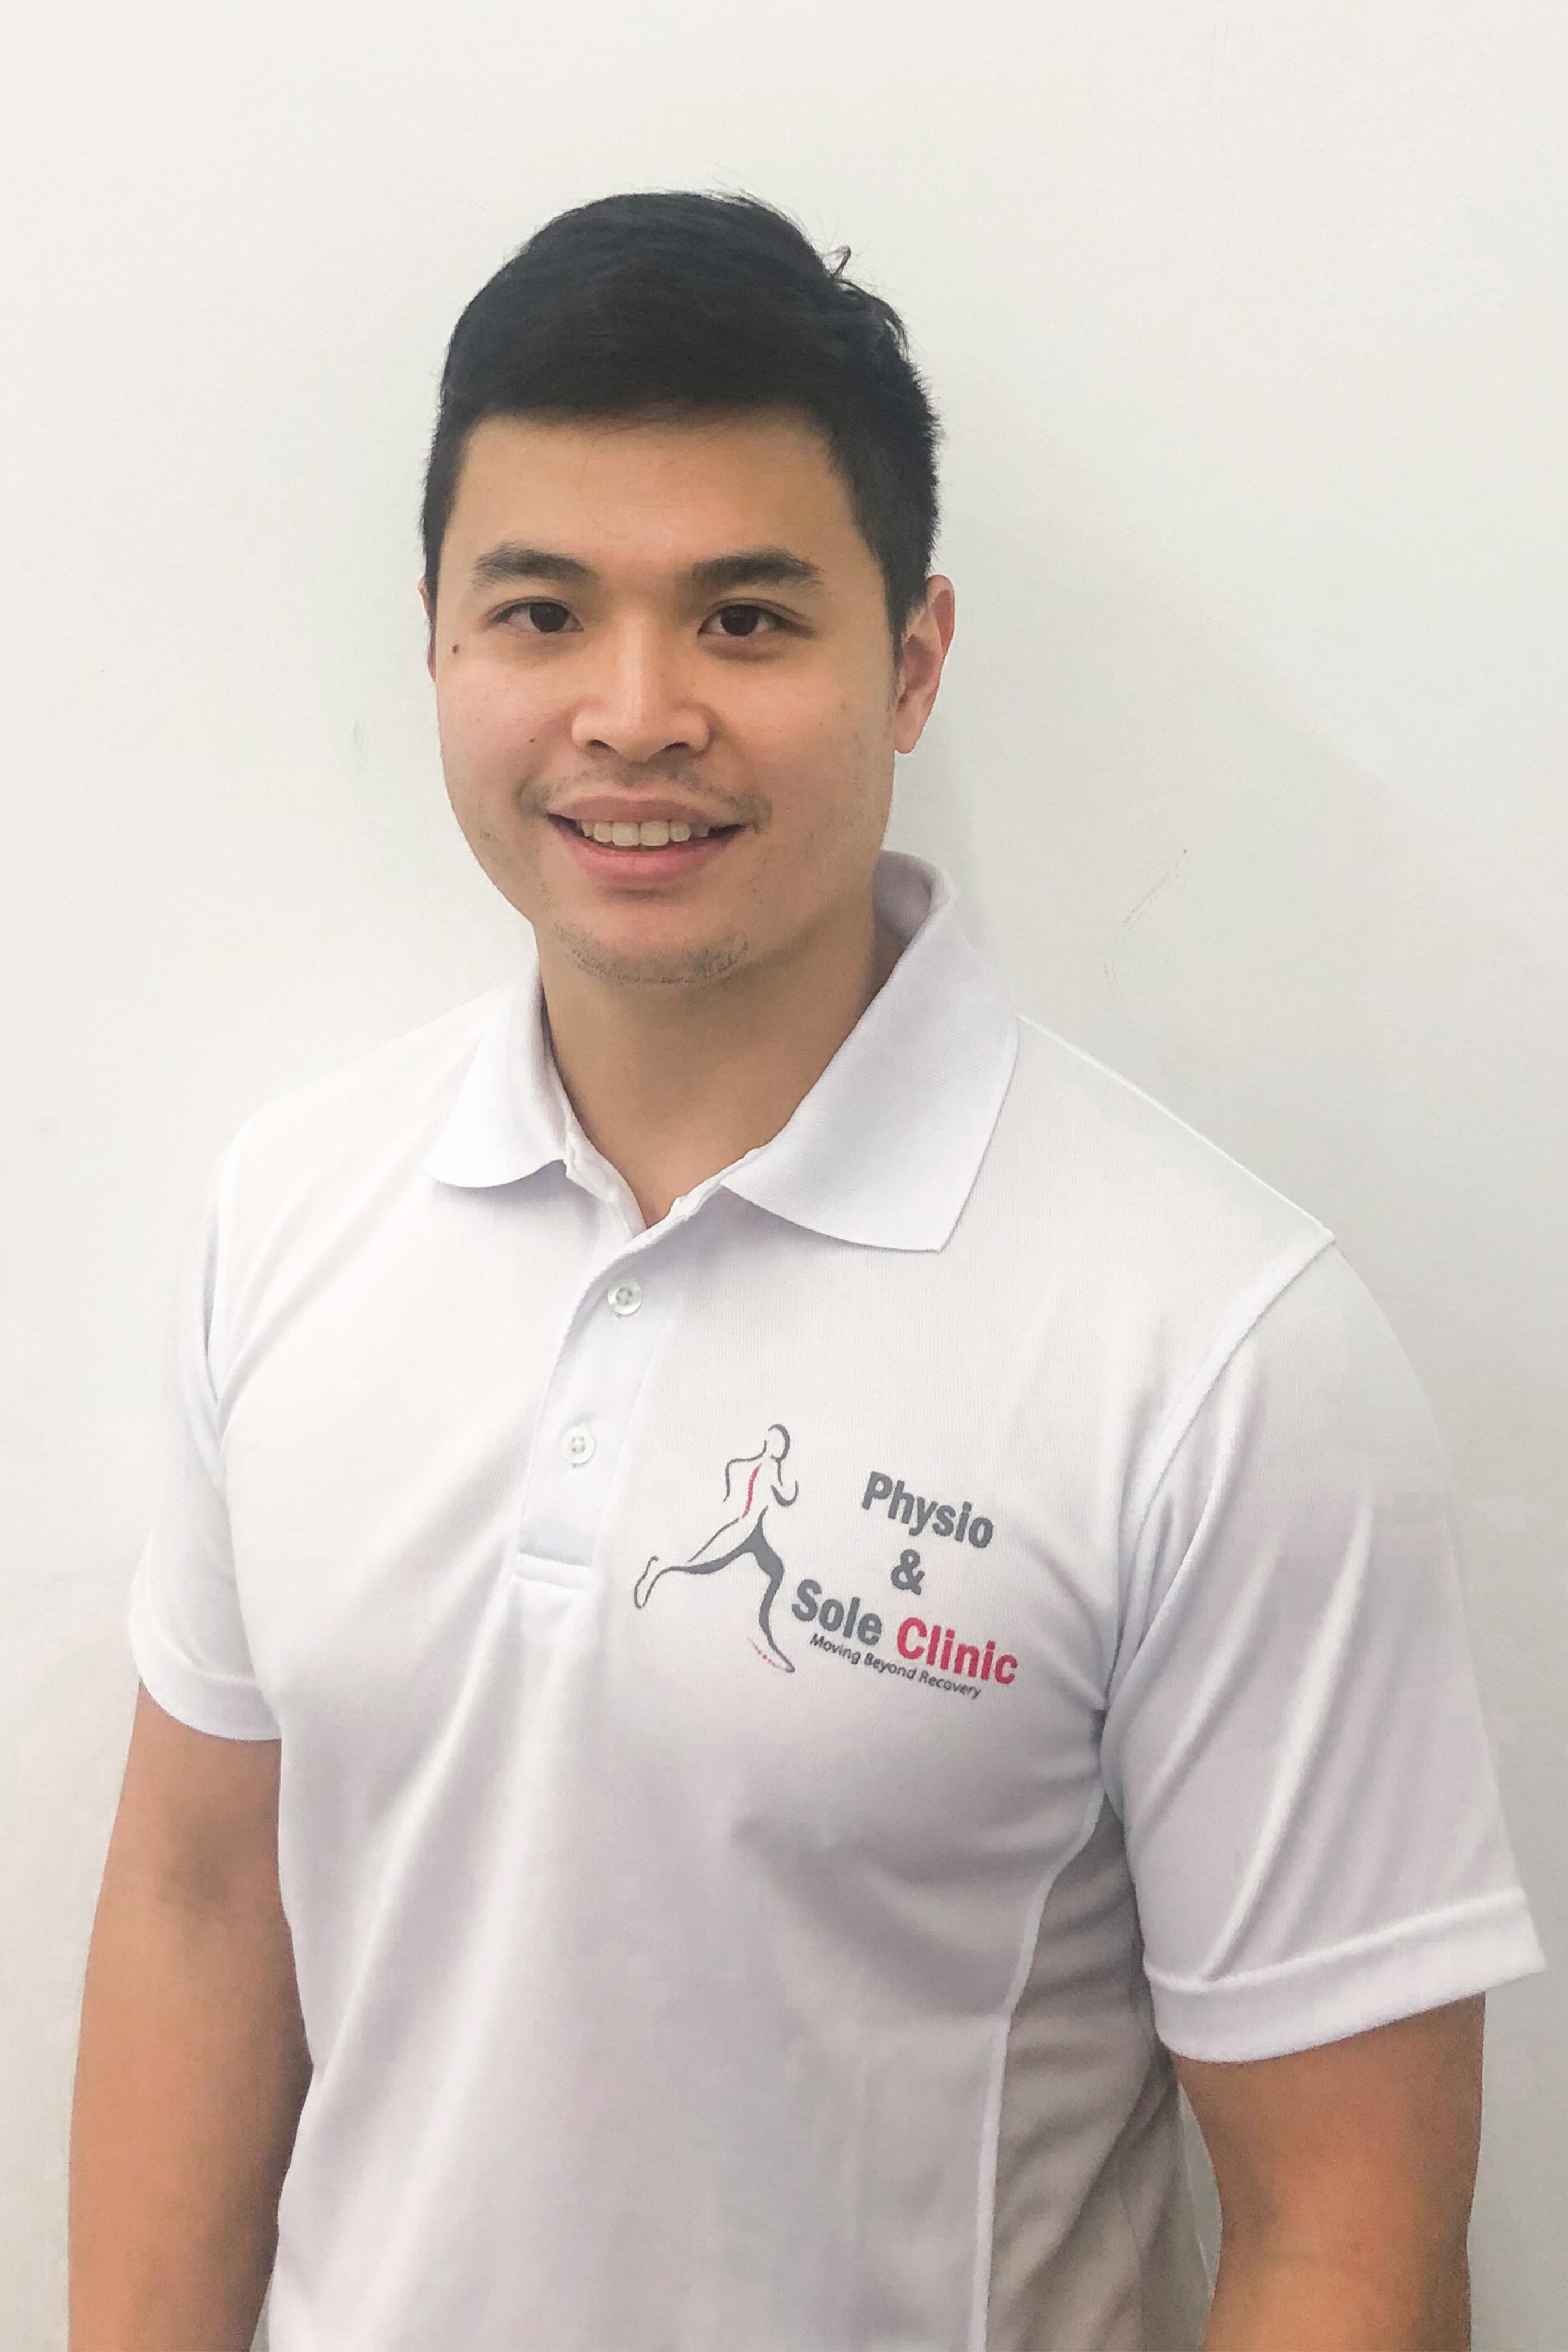 Martin Leung Ying Ho